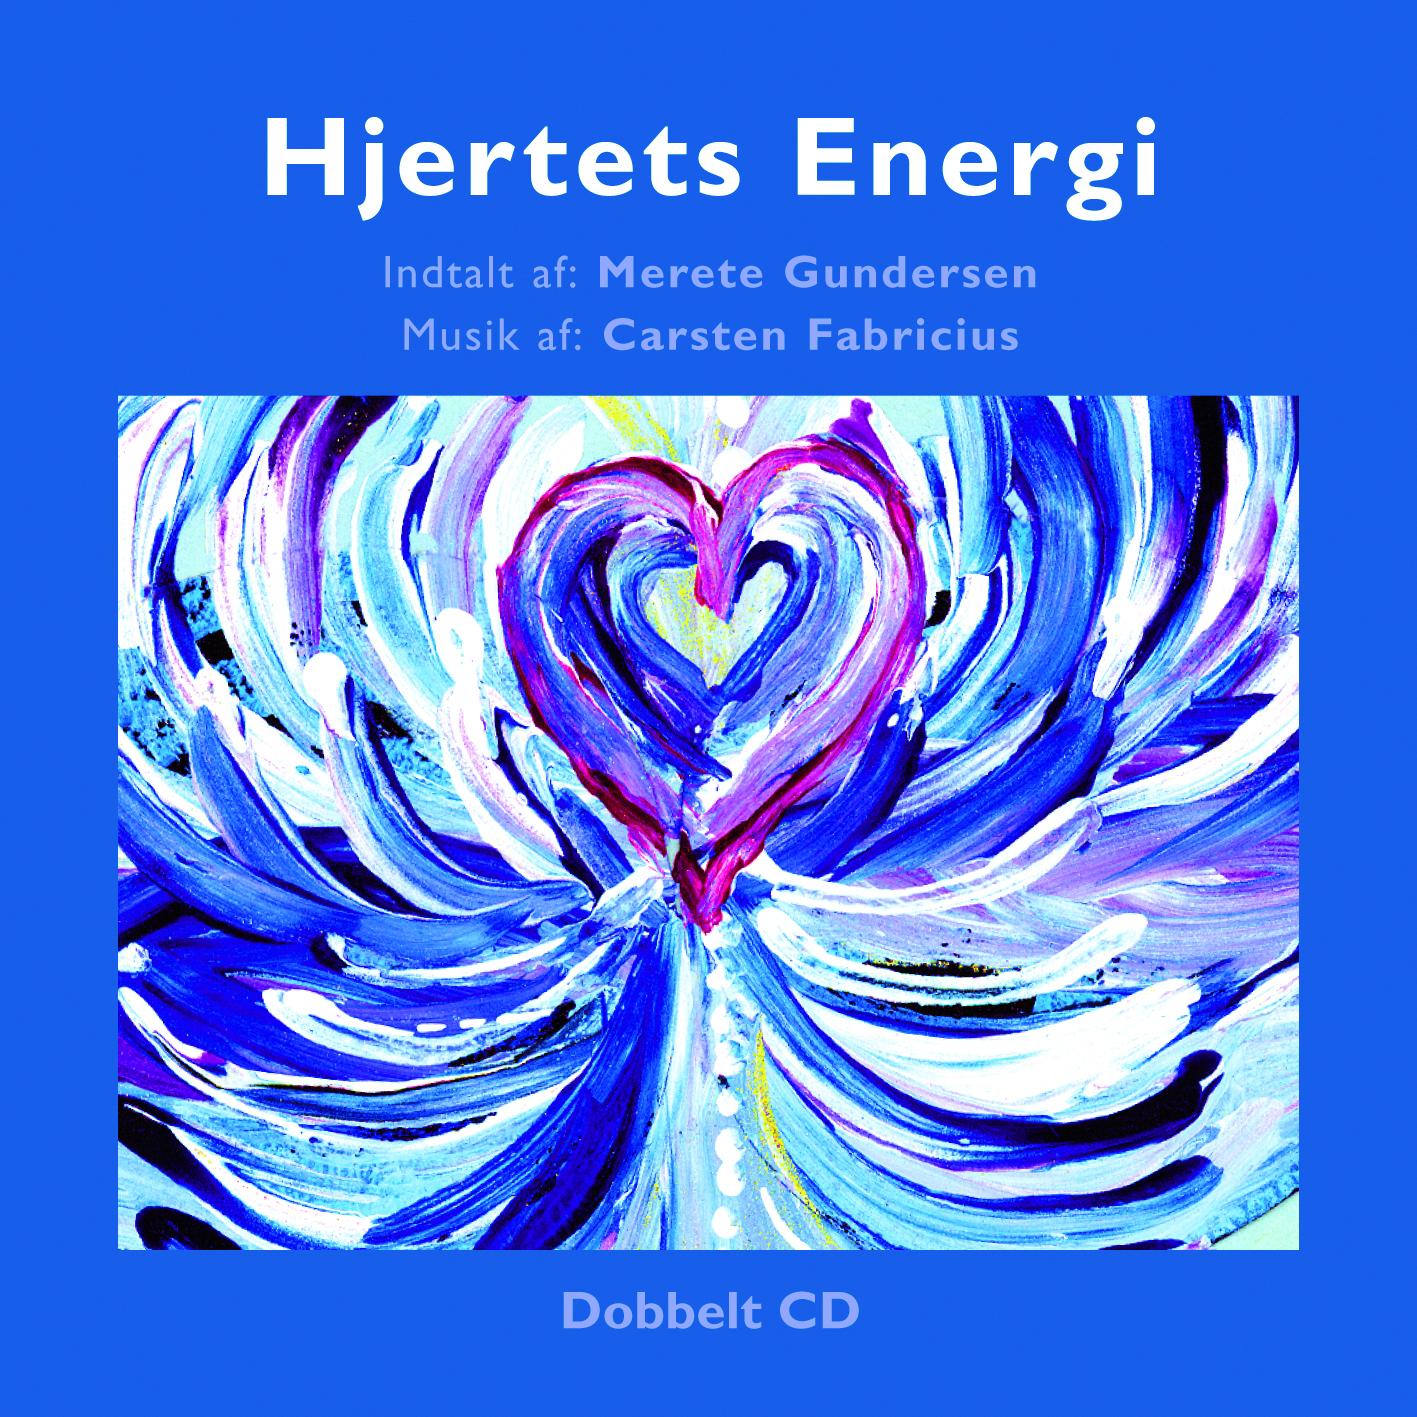 Hjertets Energi DB CD